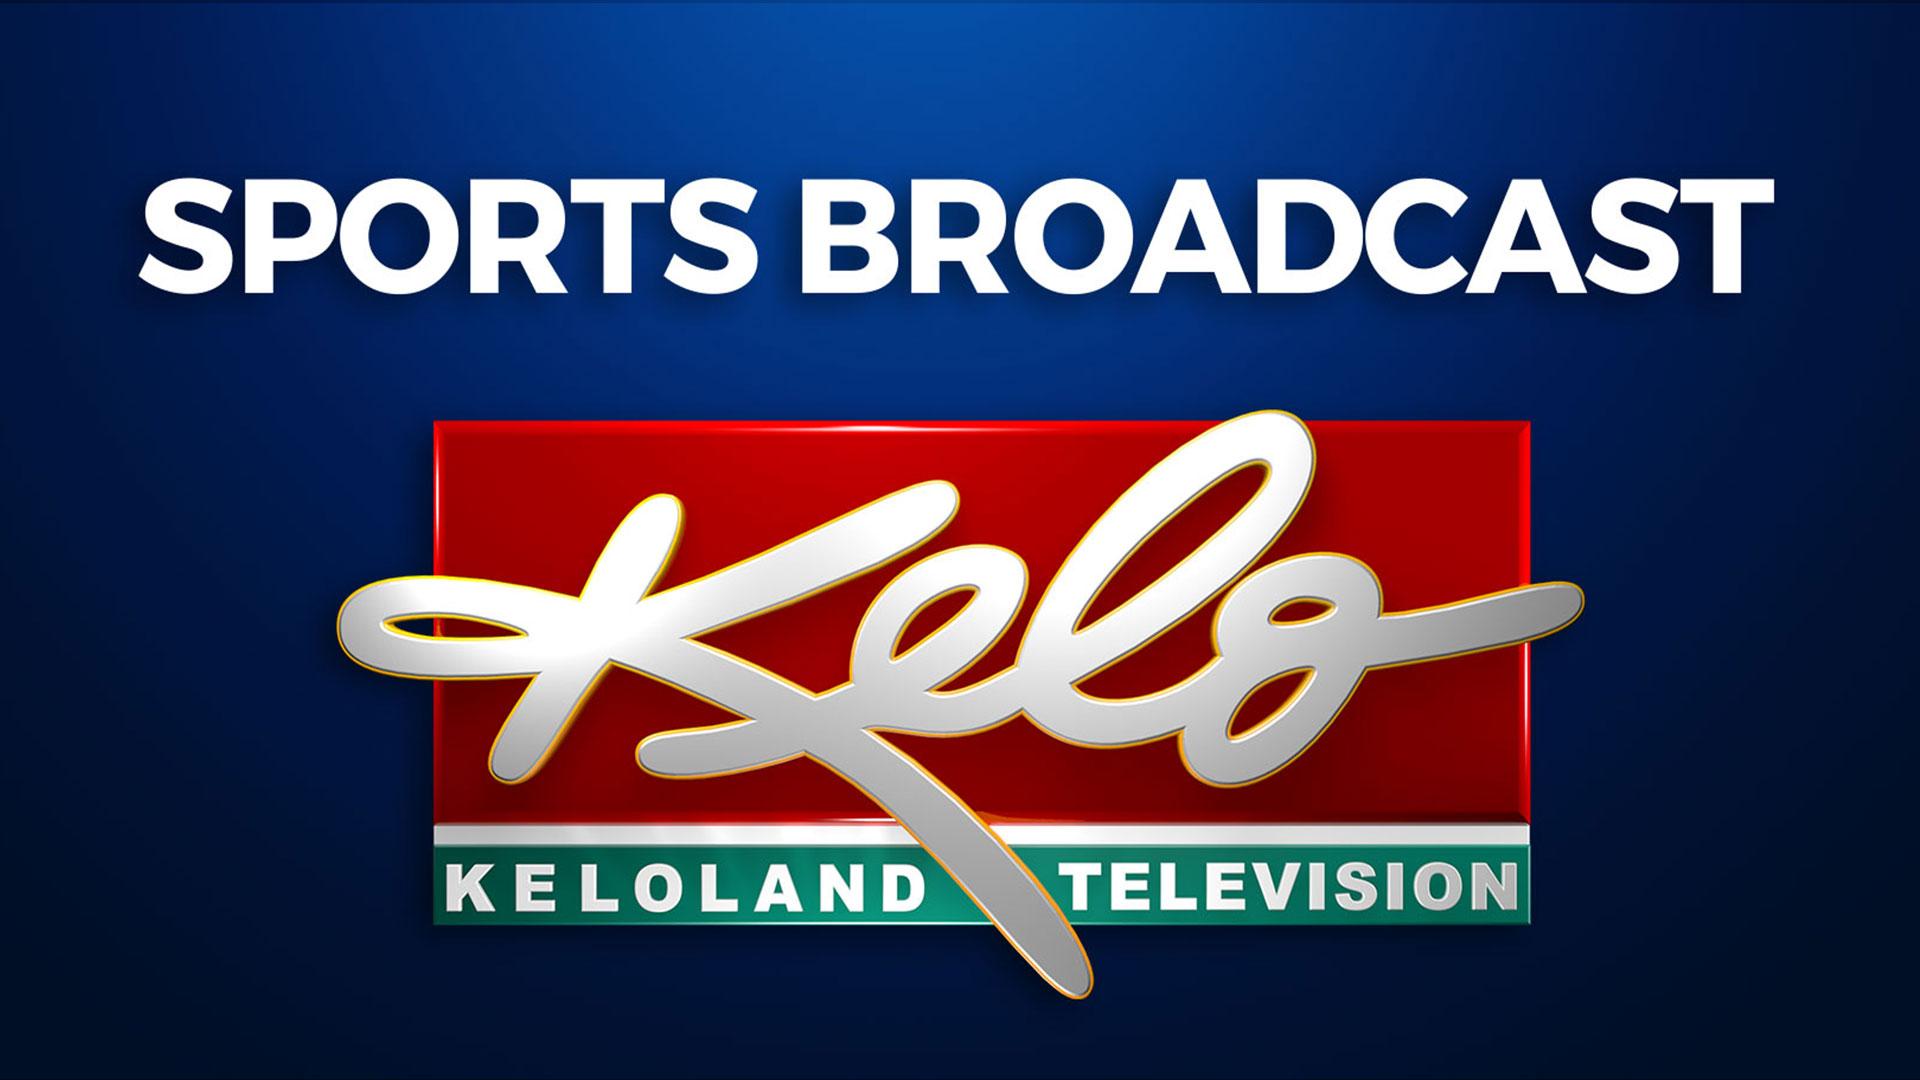 KELO Sports Broadcast